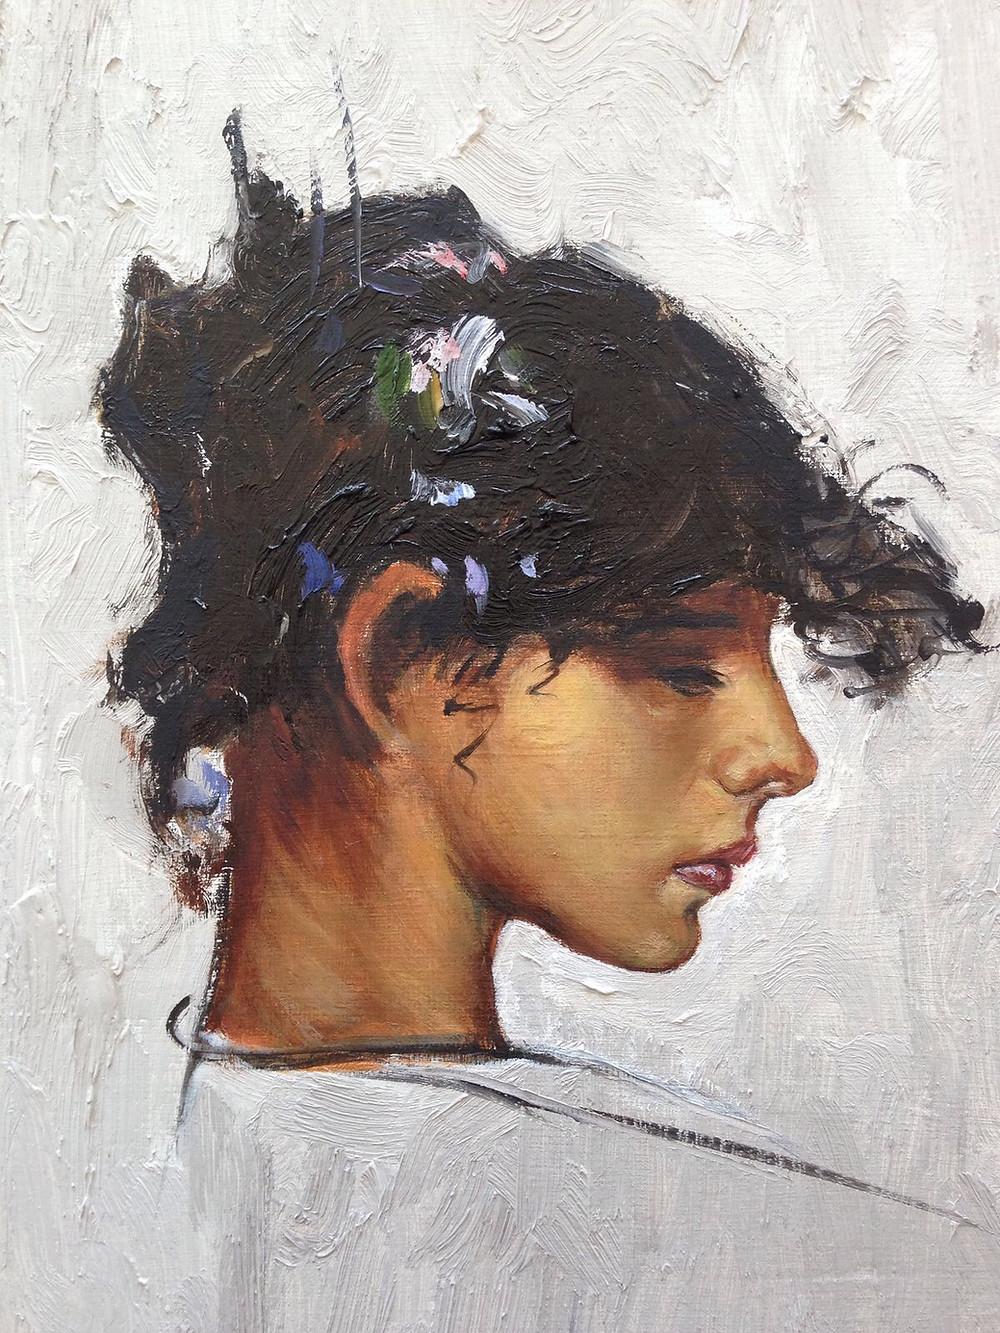 David Henty Art | John Singer Sargent | Blog